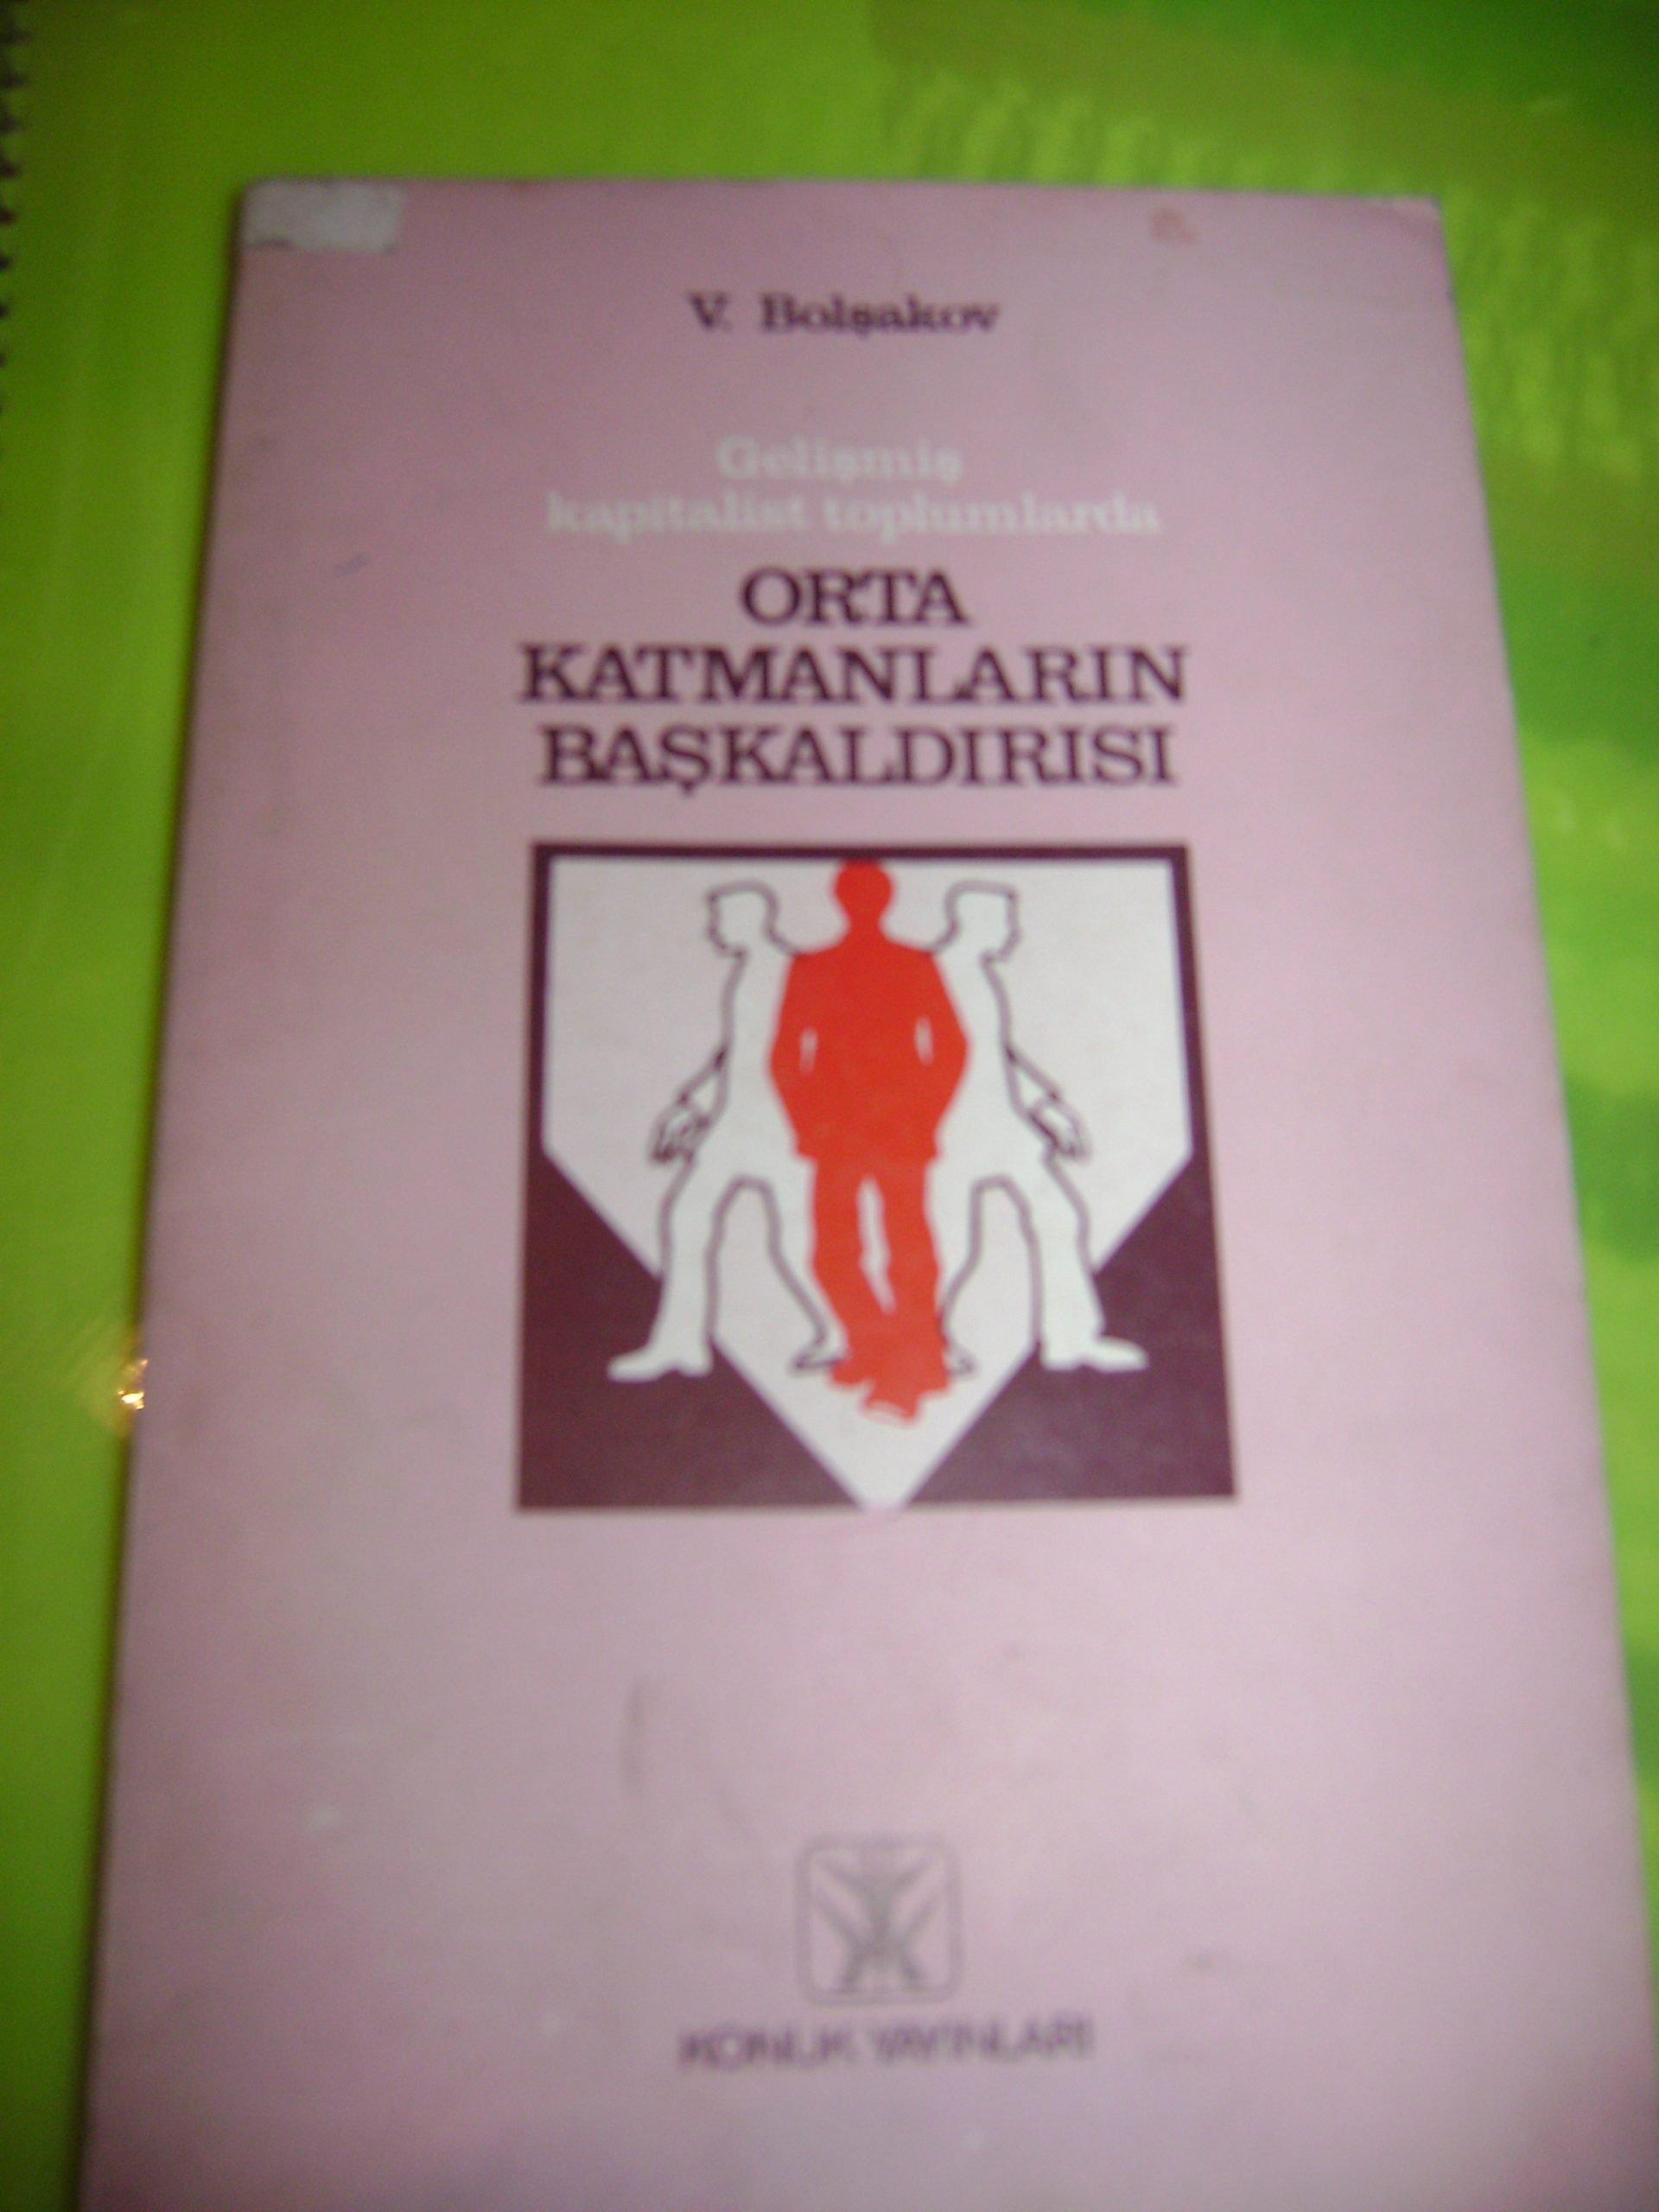 Gelişmiş Kapıtalist Toplumlarda ORTA KATMANLARIN BAŞKALDIRISI/ V.Bolşakov/15 tl